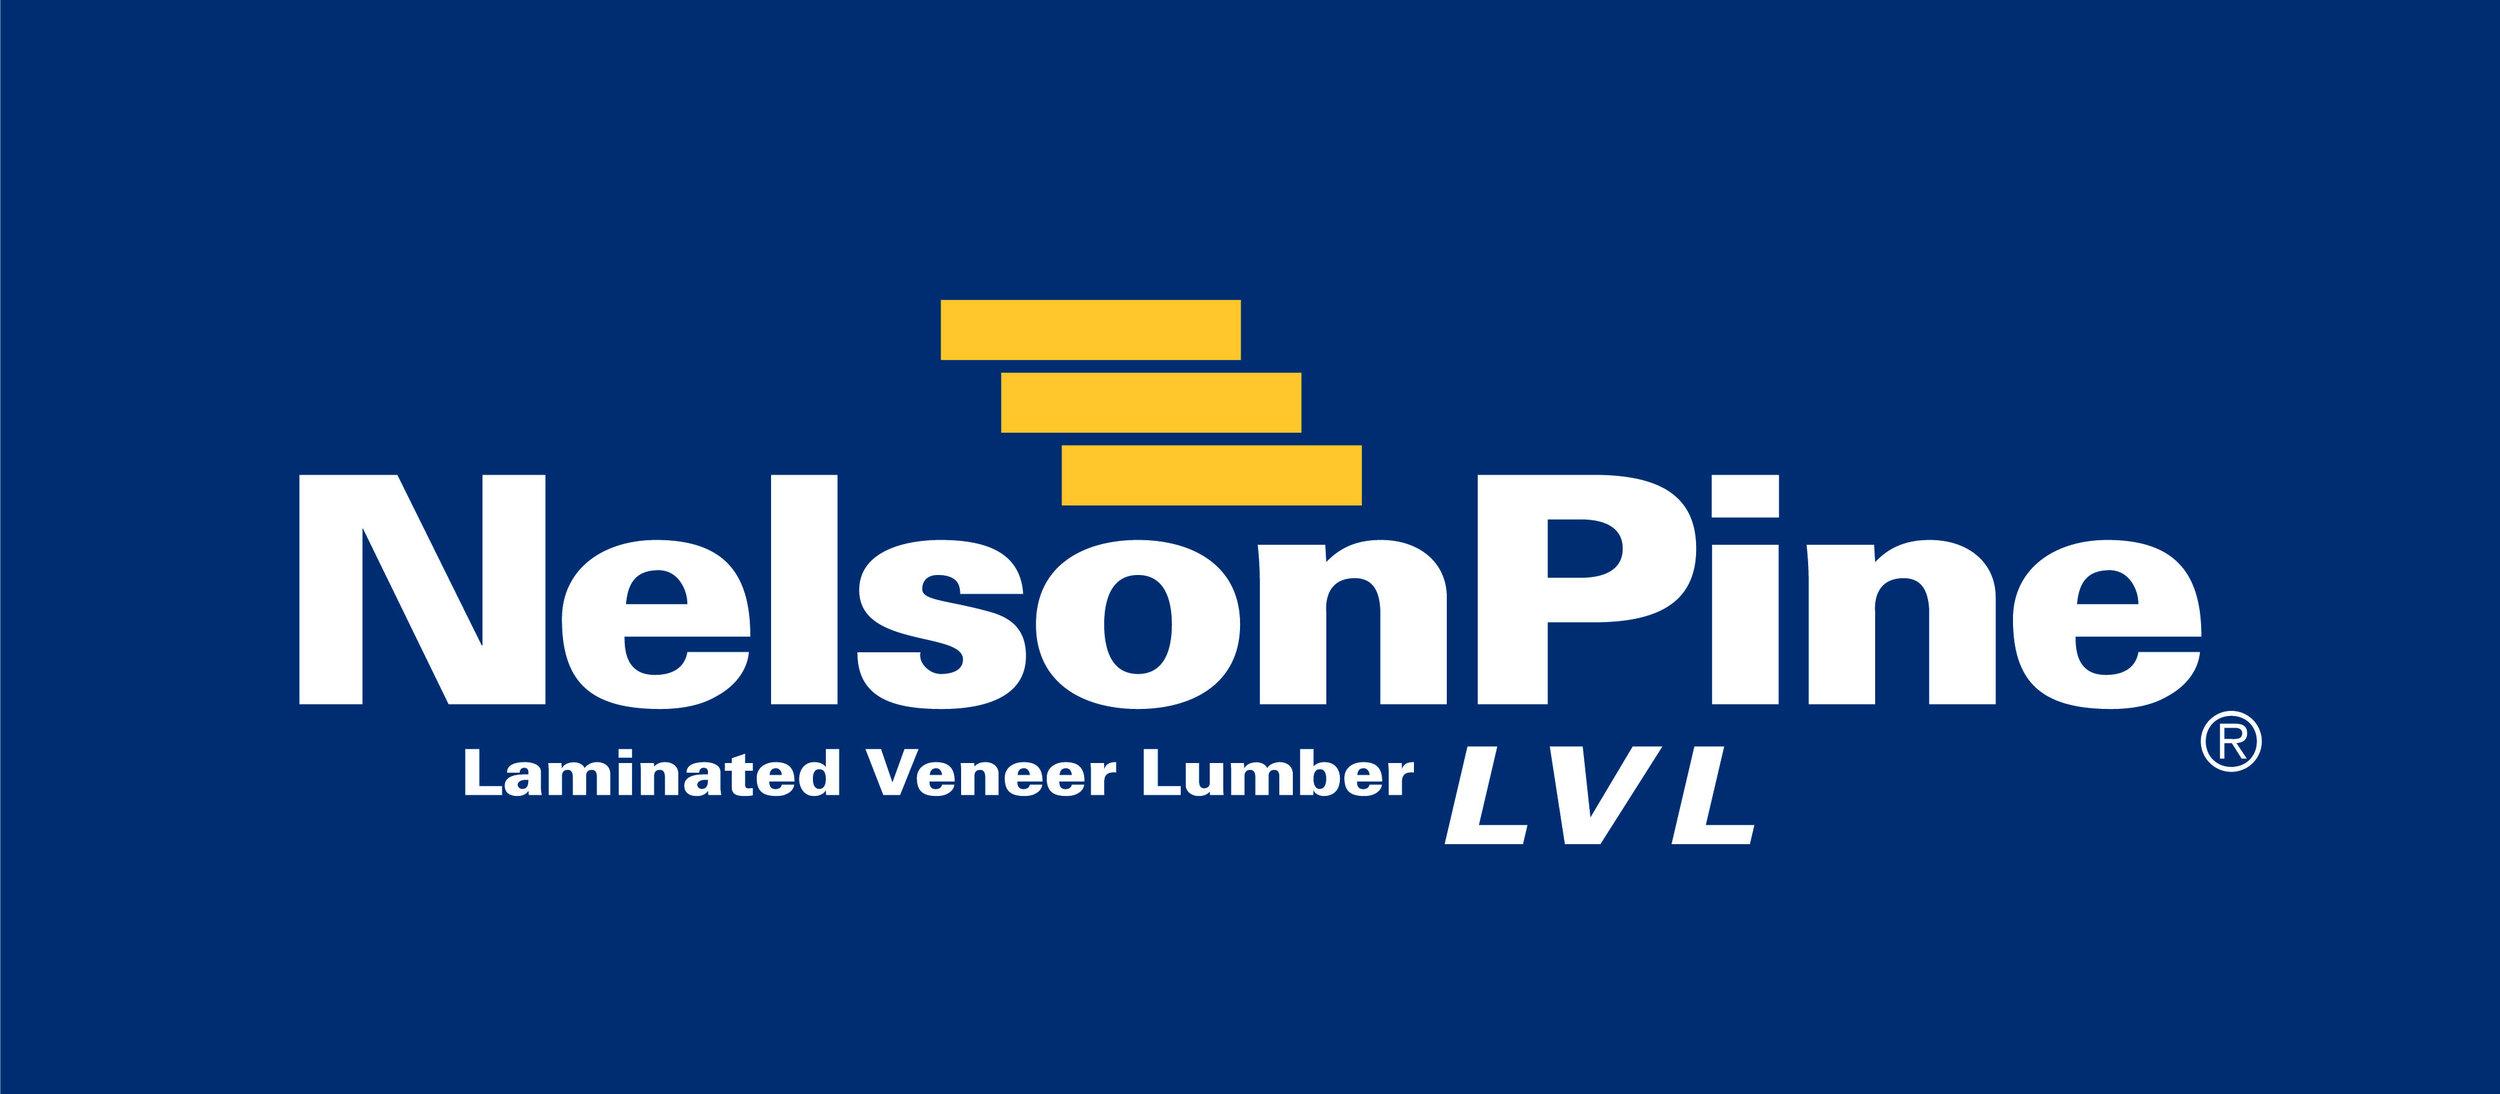 NelsonPine-LVL-logo-Pantone-Reversed-Large.jpg